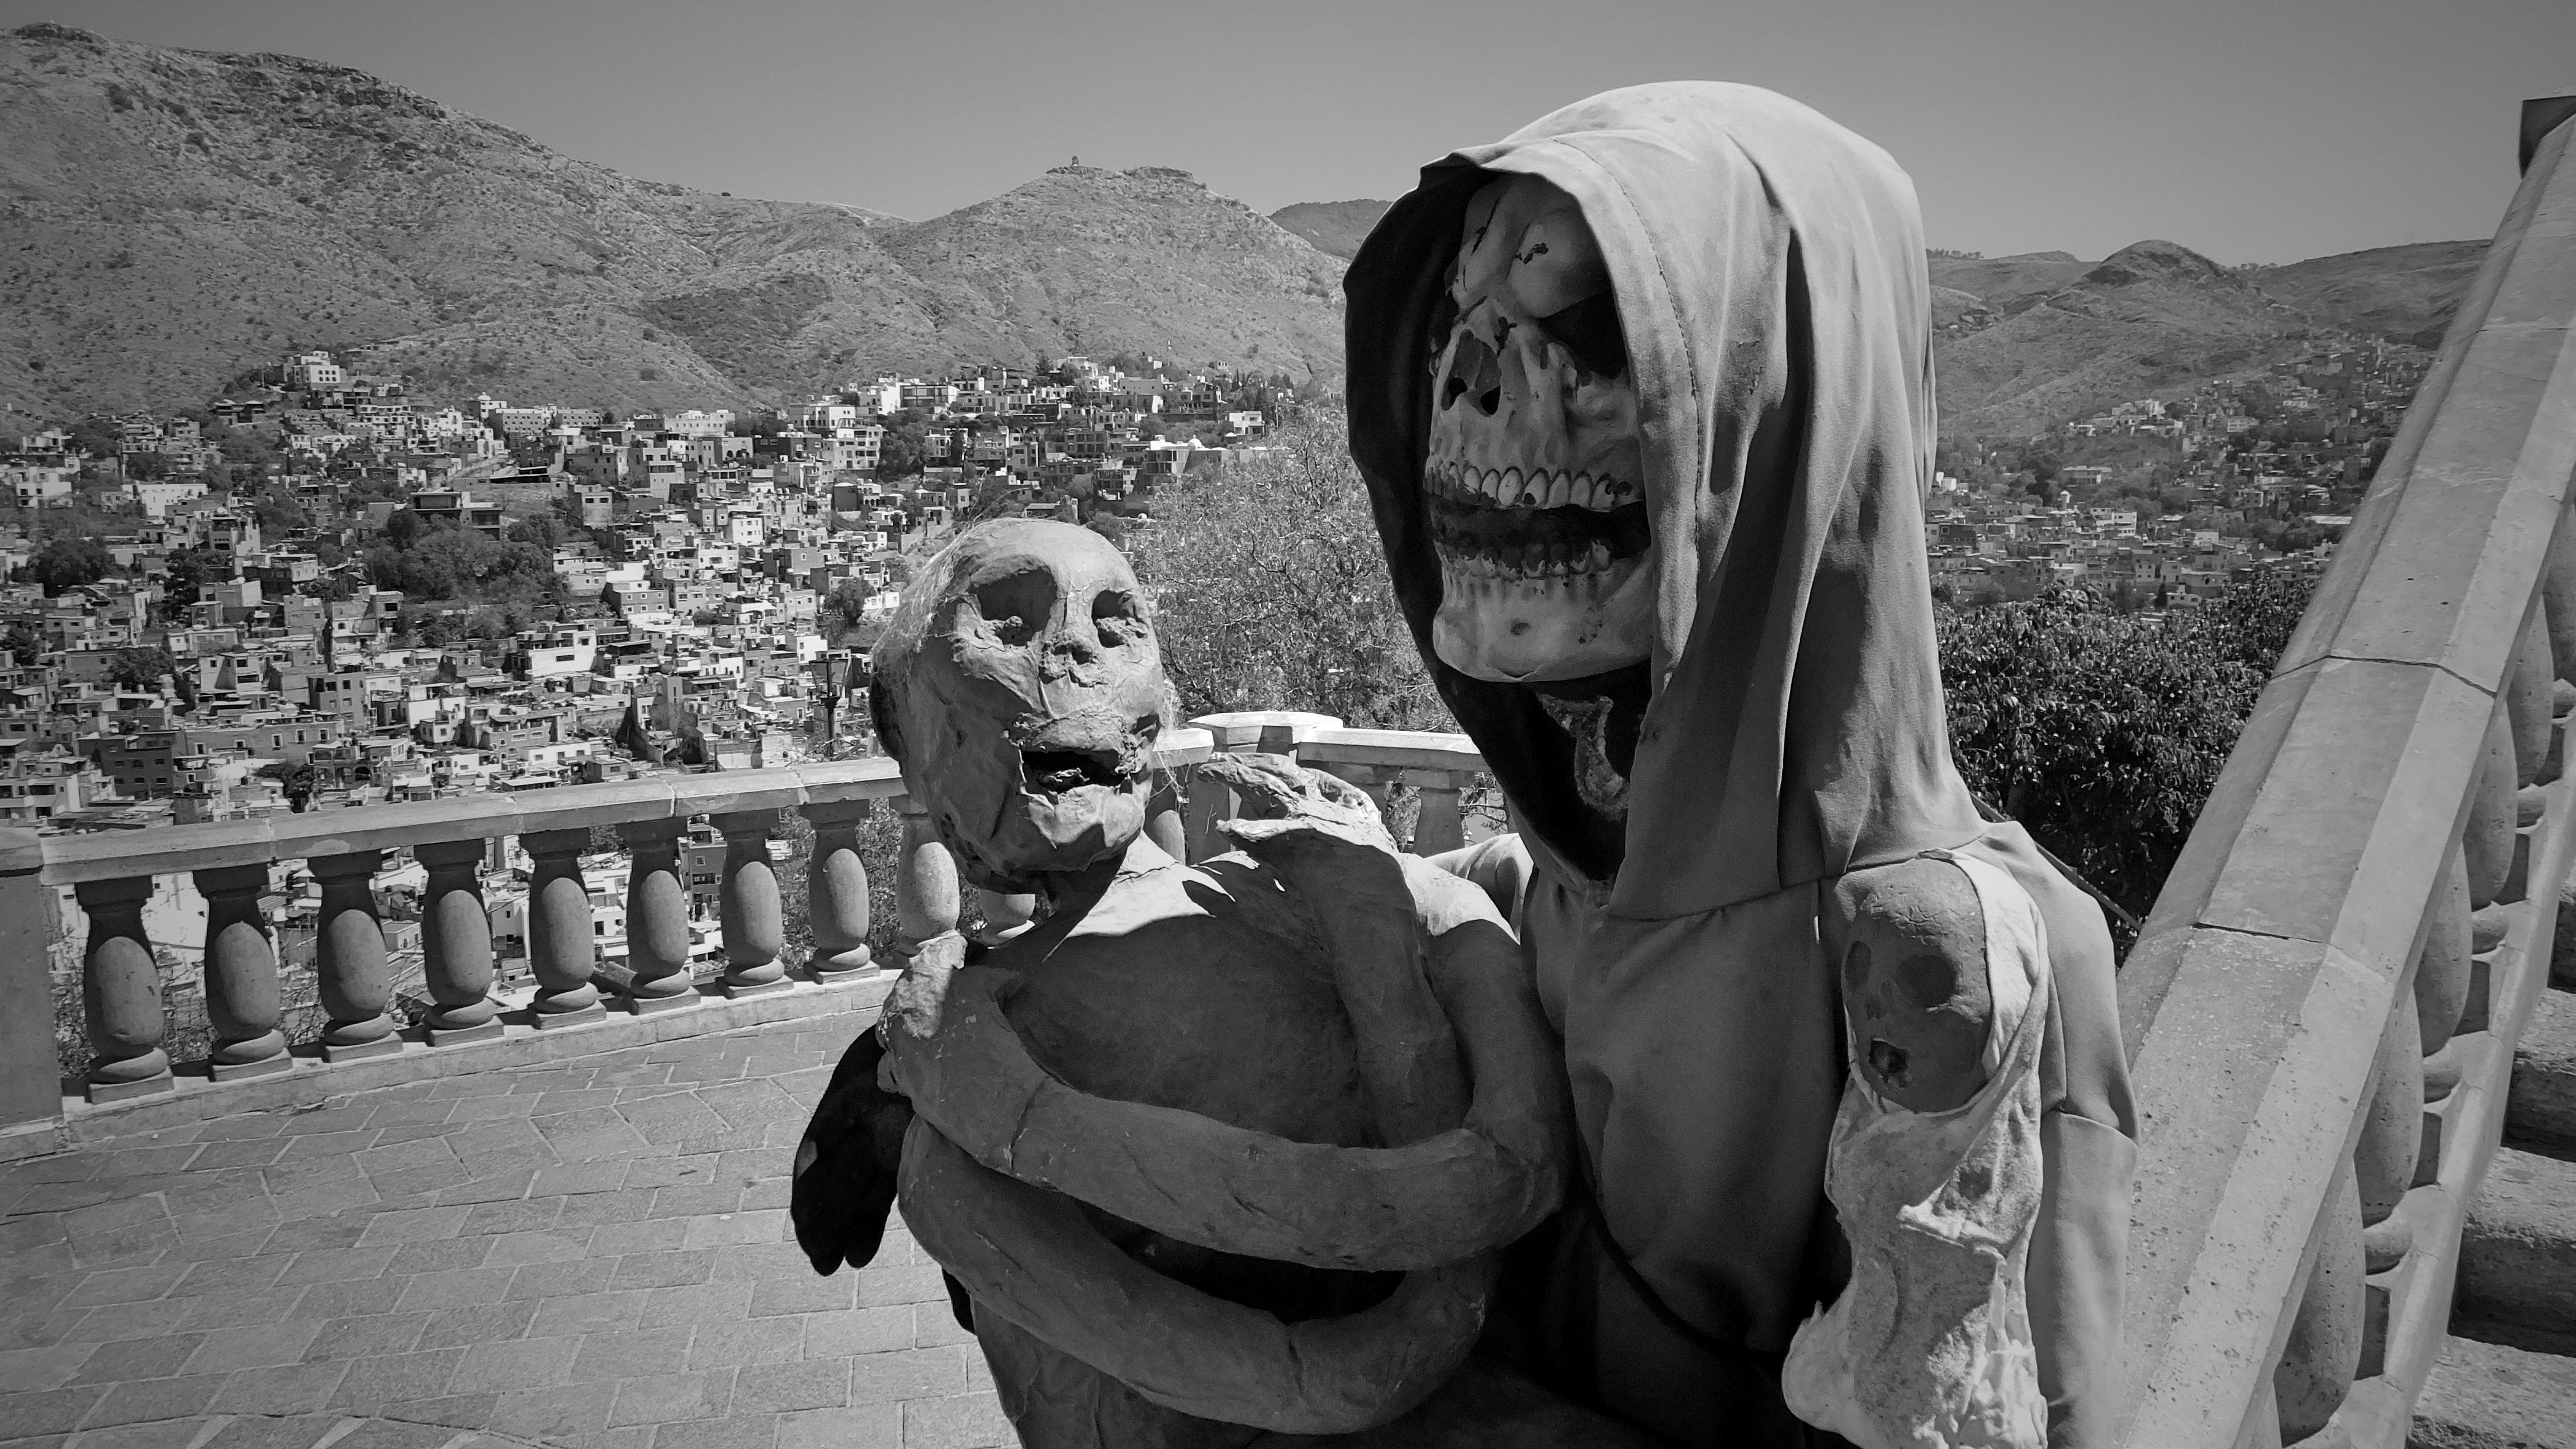 Ms. bones